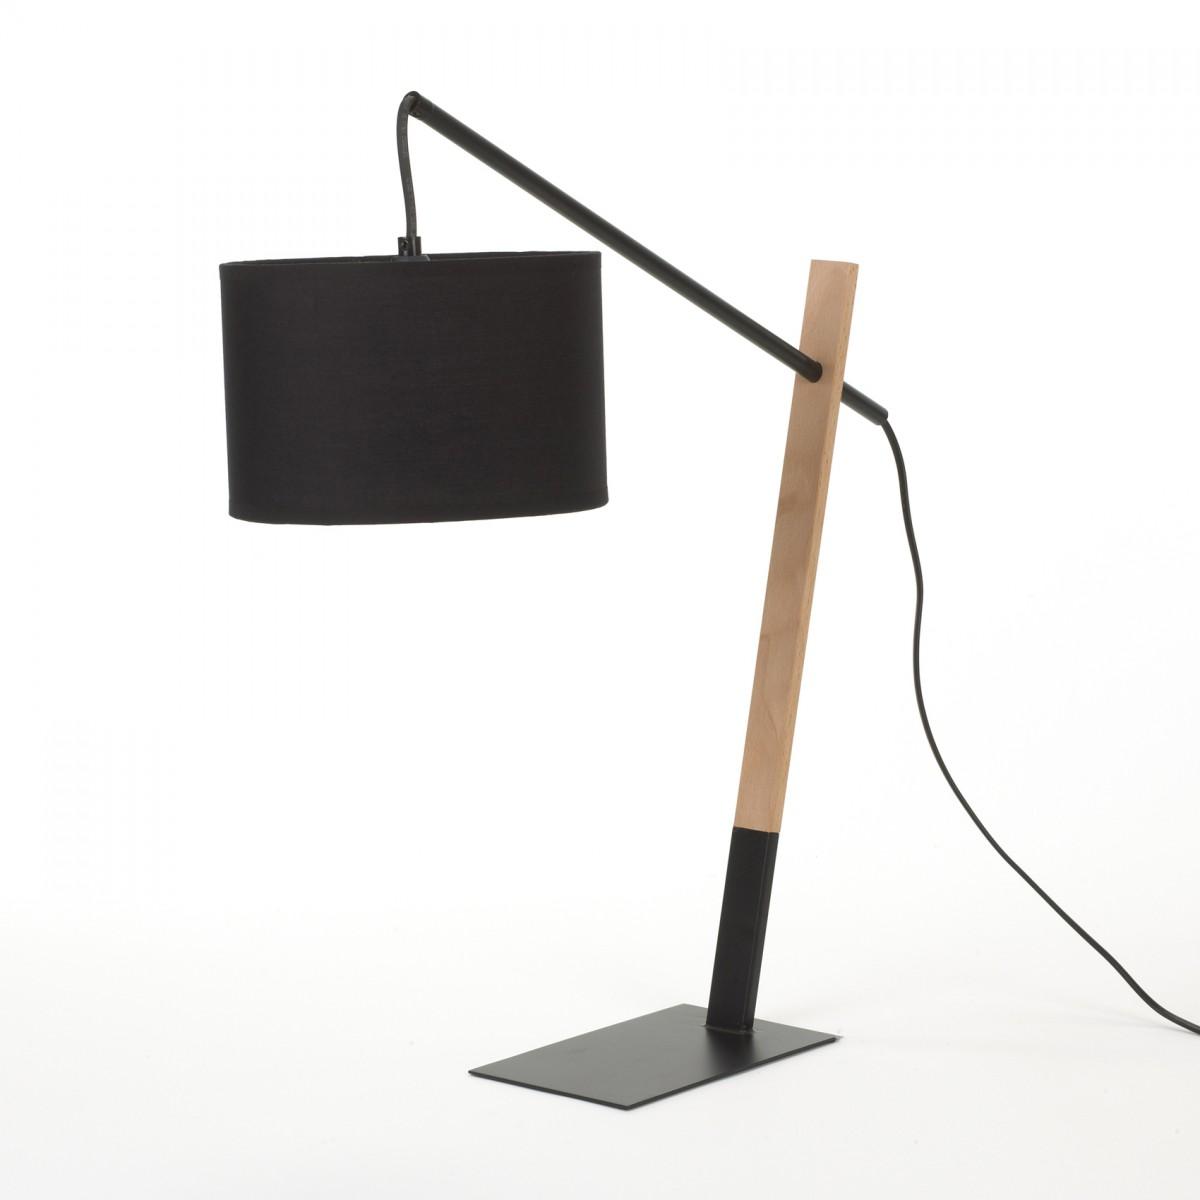 Table lamp adjustable - Adjustable Table Lamps